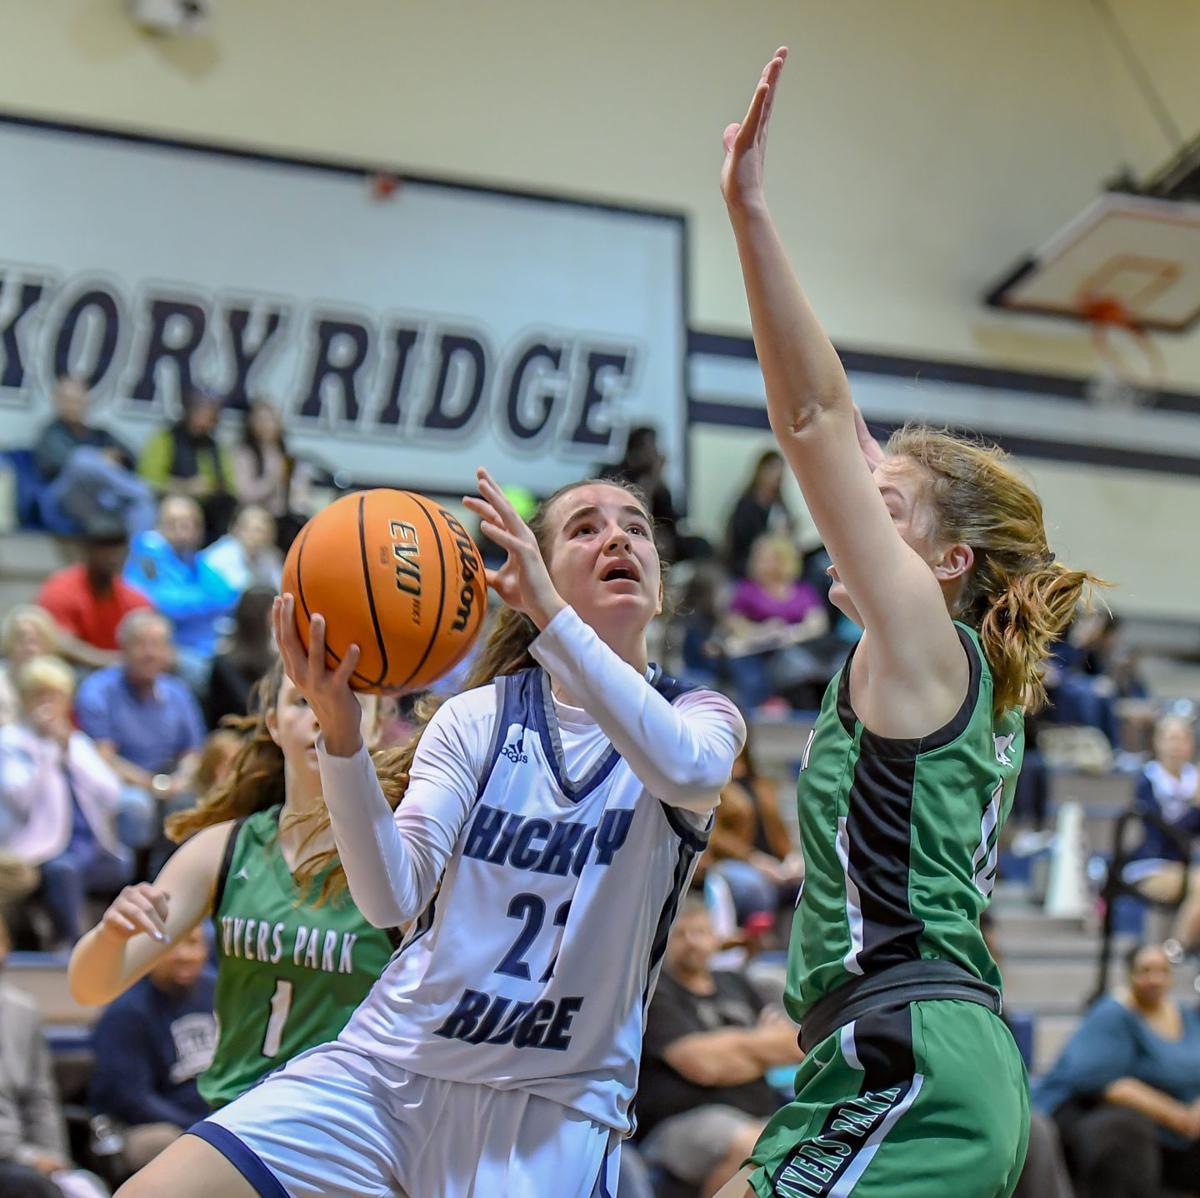 Tuesday night high school basketball action